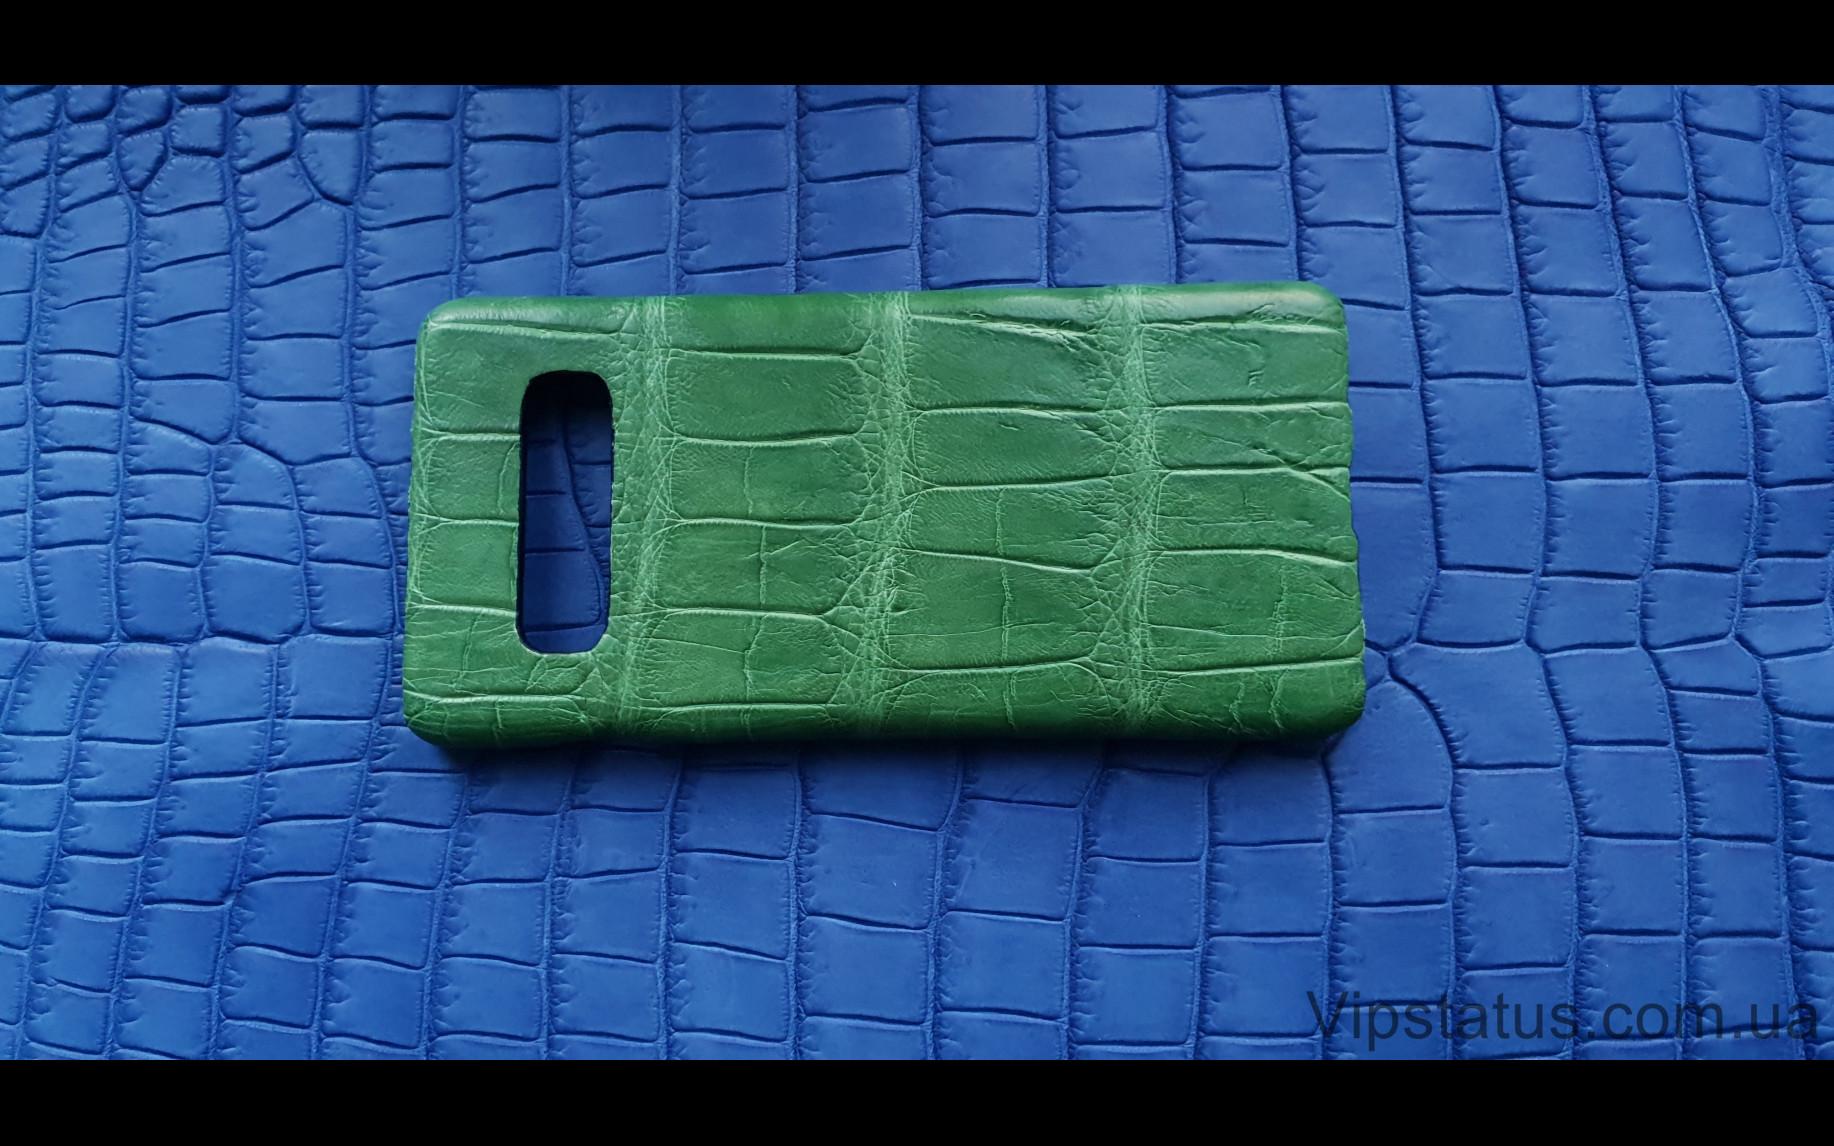 Elite Light Green Экзотический чехол Samsung Galaxy S10 Plus Light Green Exotic case Samsung Galaxy S10 Plus Crocodile leather image 4